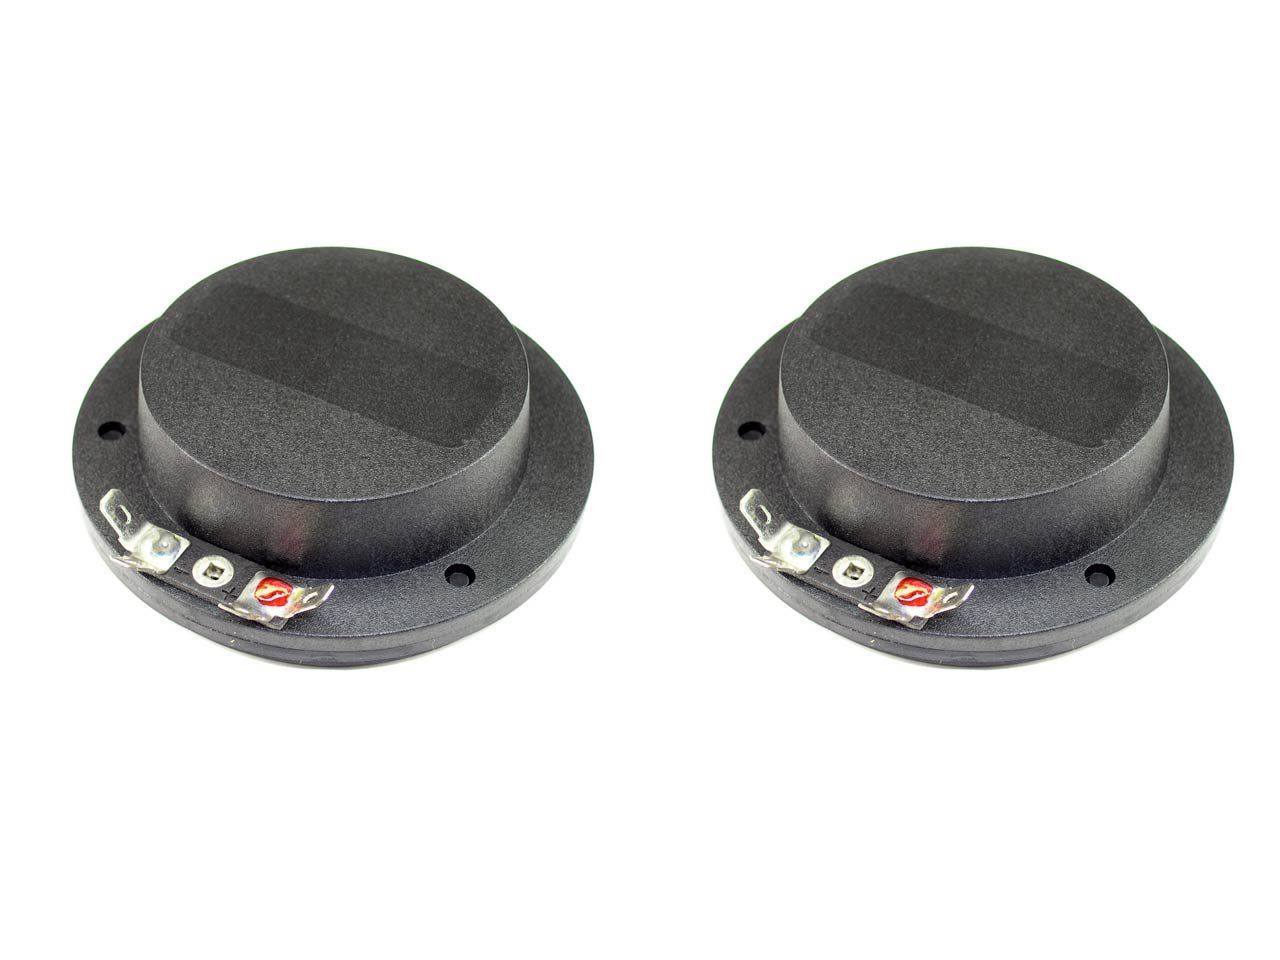 SS Audio Diaphragm for Yamaha JAY-2060, JAY2080 Horn Driver, 8 Ohm, D-101AFT-8 (2 PACK)